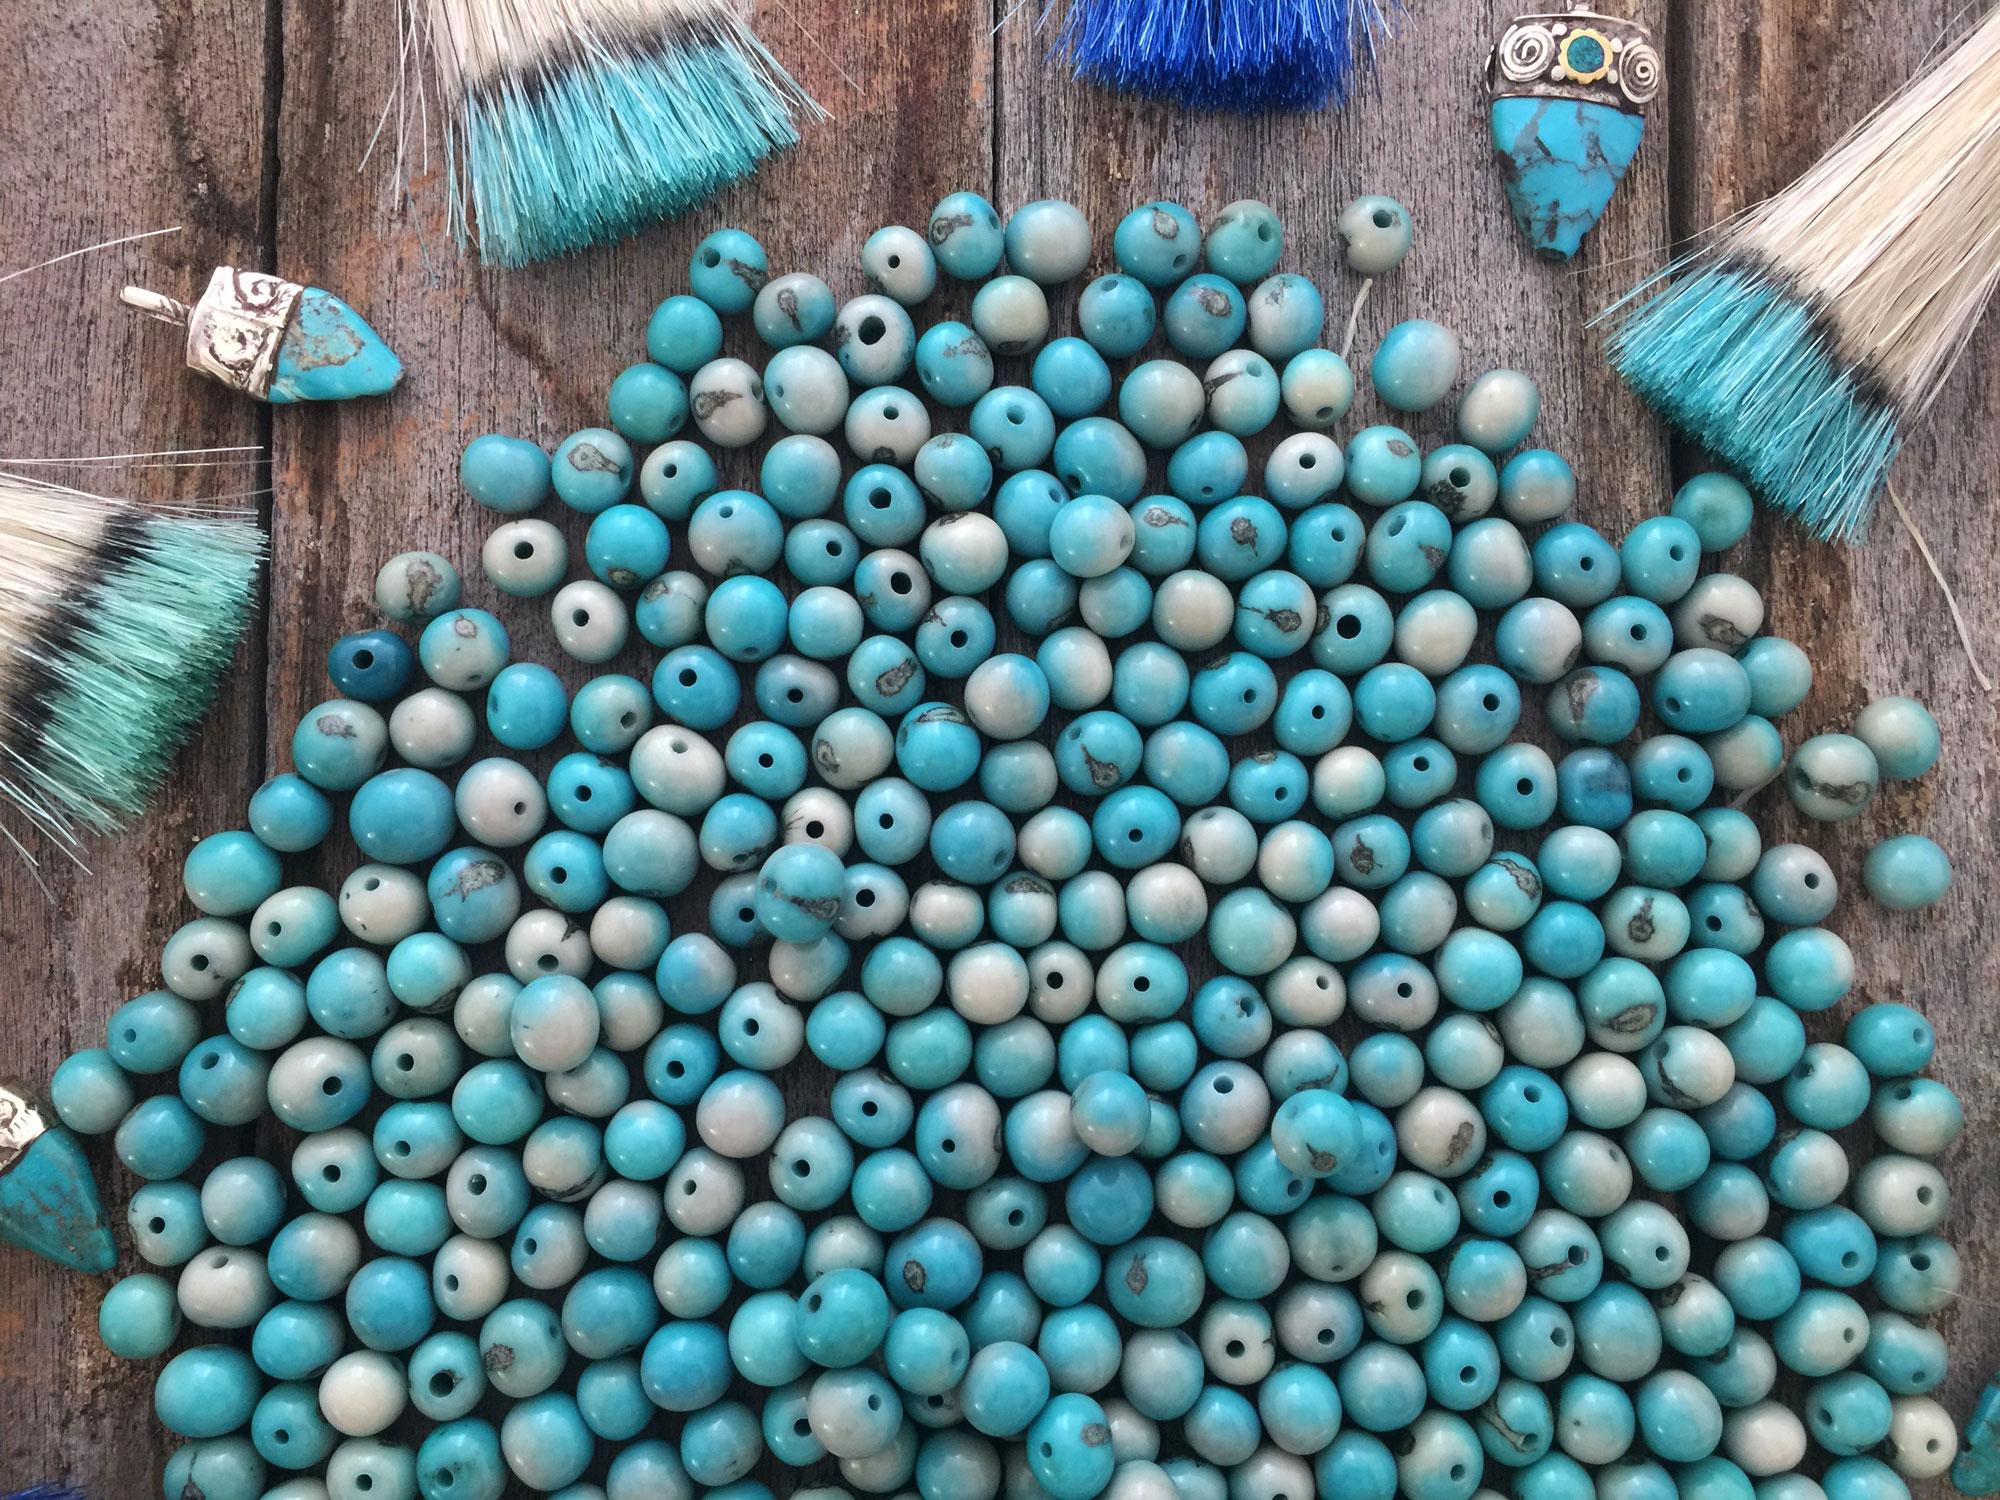 Aqua-Blue-Two-Tone-Acai-Beads-7.jpg